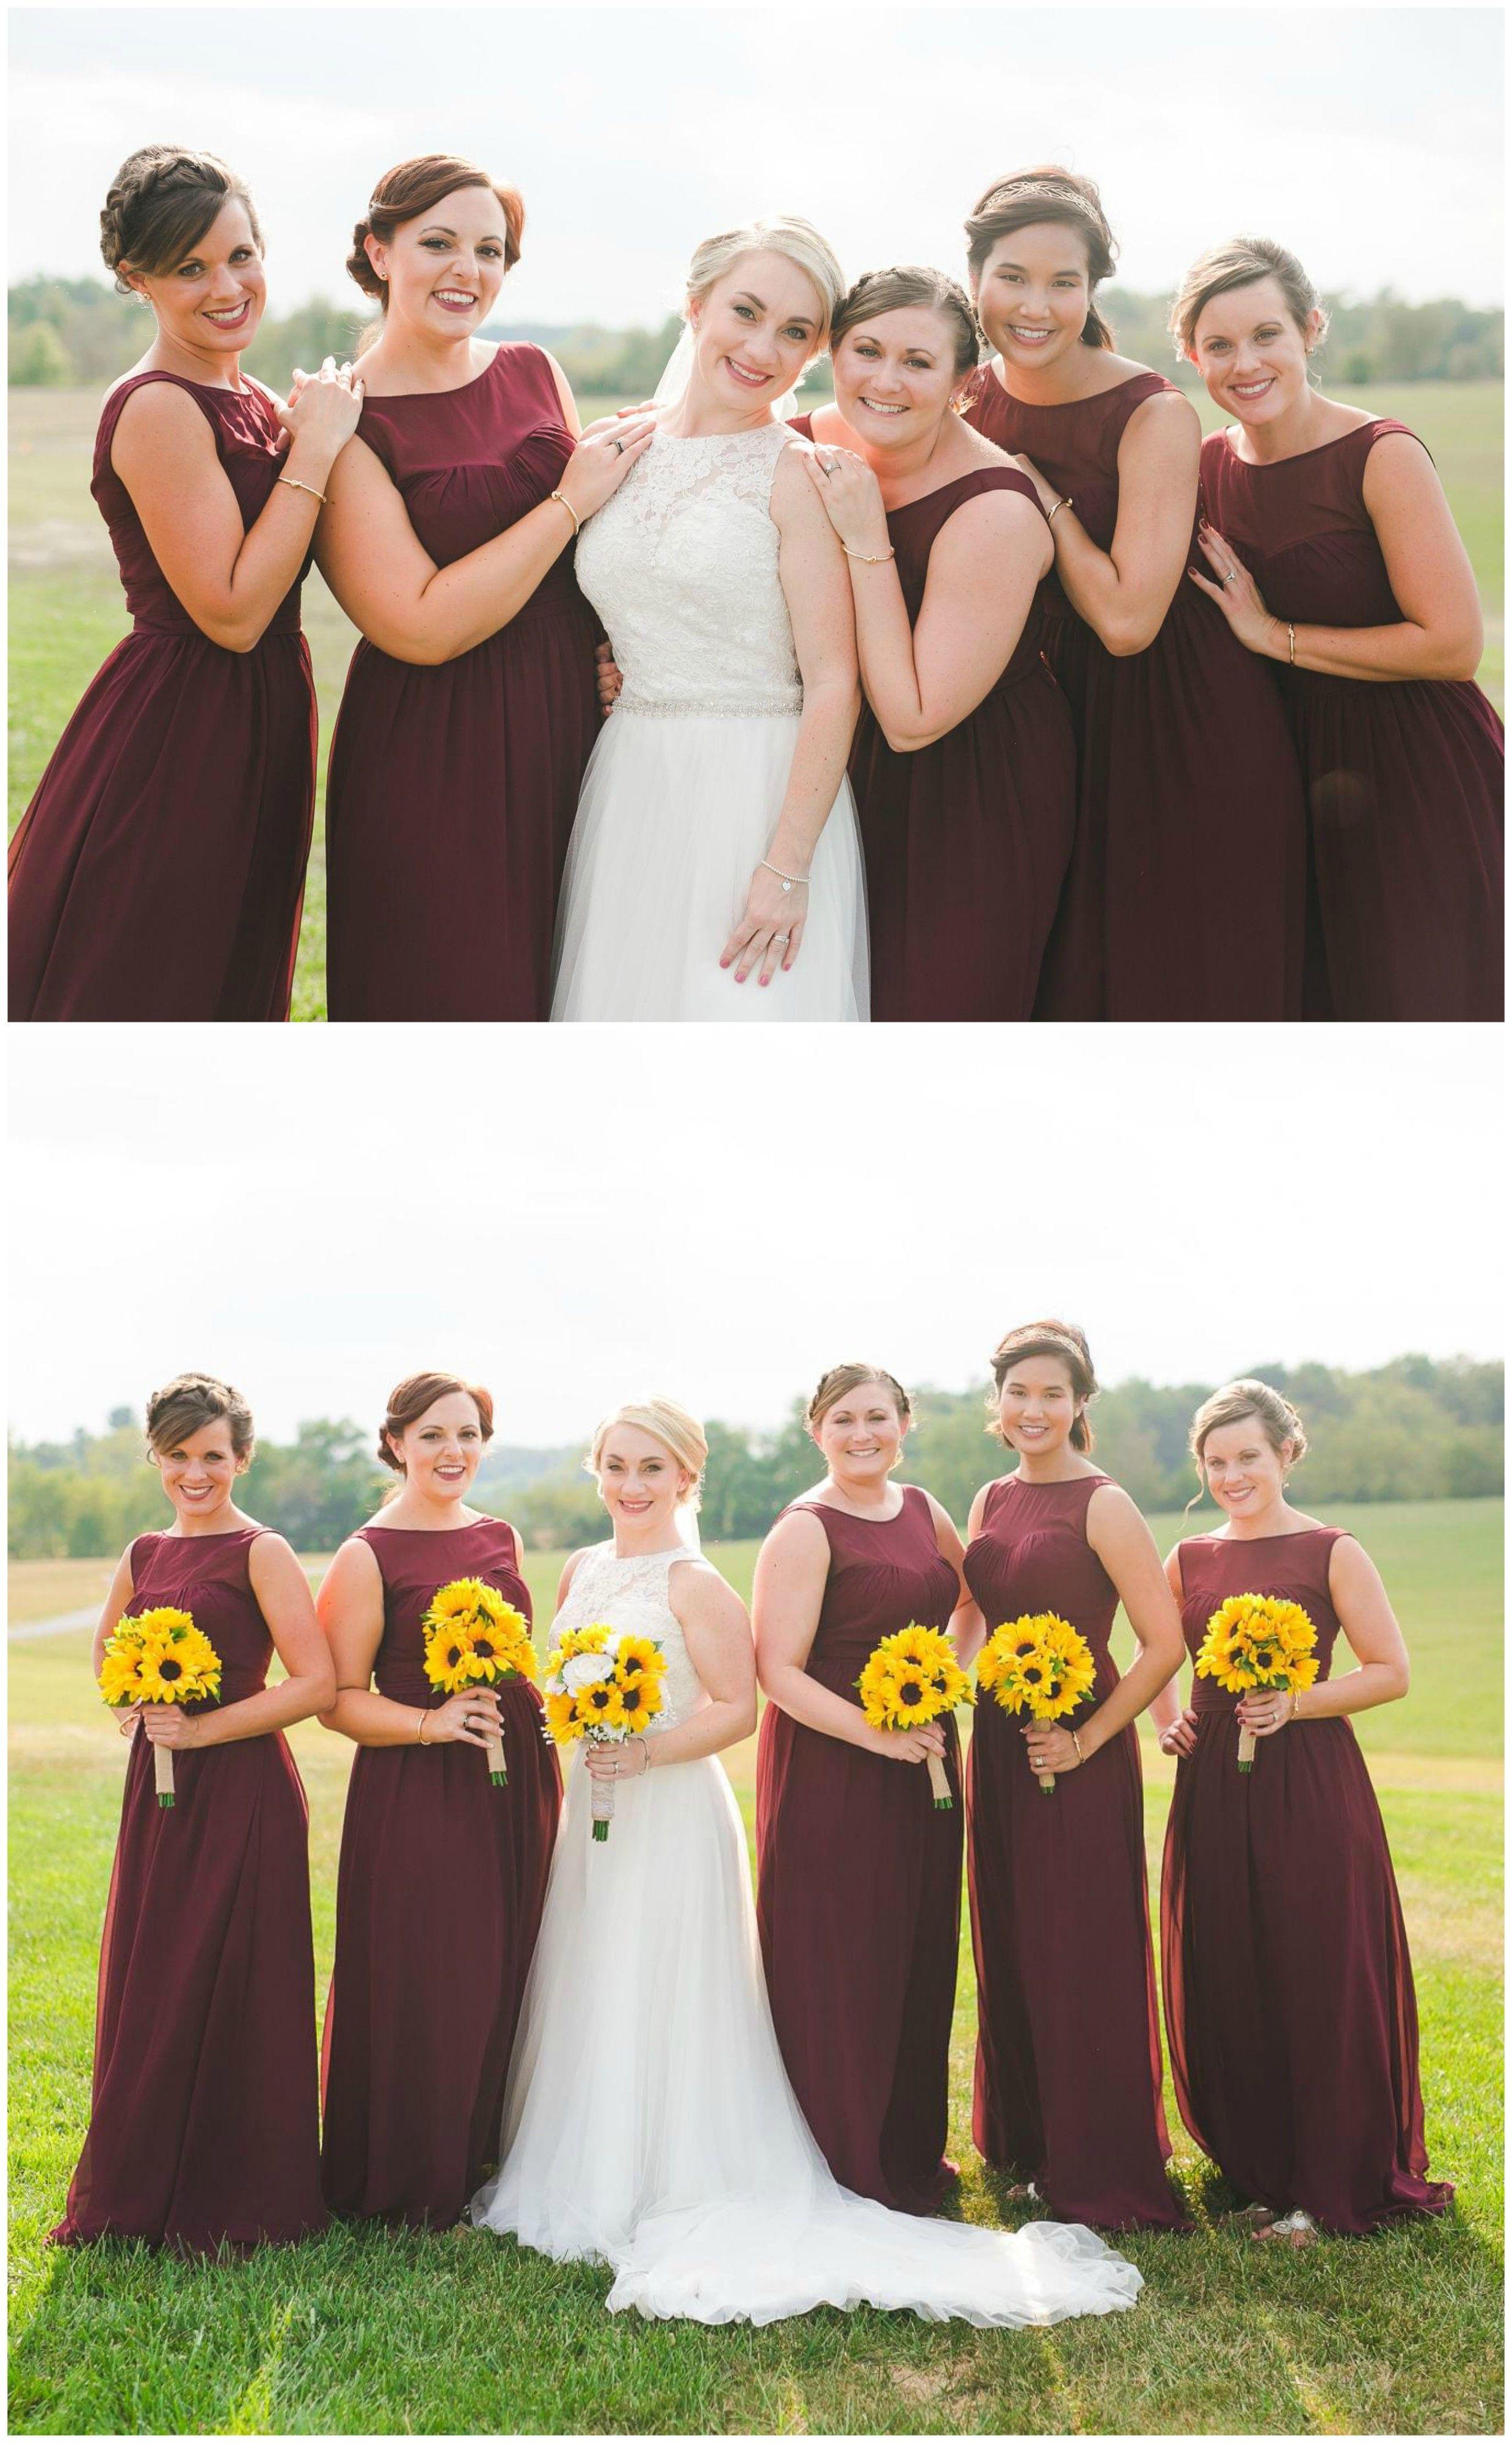 Wine Colored Bridesmaid Dresses Yellow Sunflower Wedding Bouquets Elegant Summertime Wine Bridesmaid Dresses Wine Colored Wedding Wedding Bridesmaid Dresses